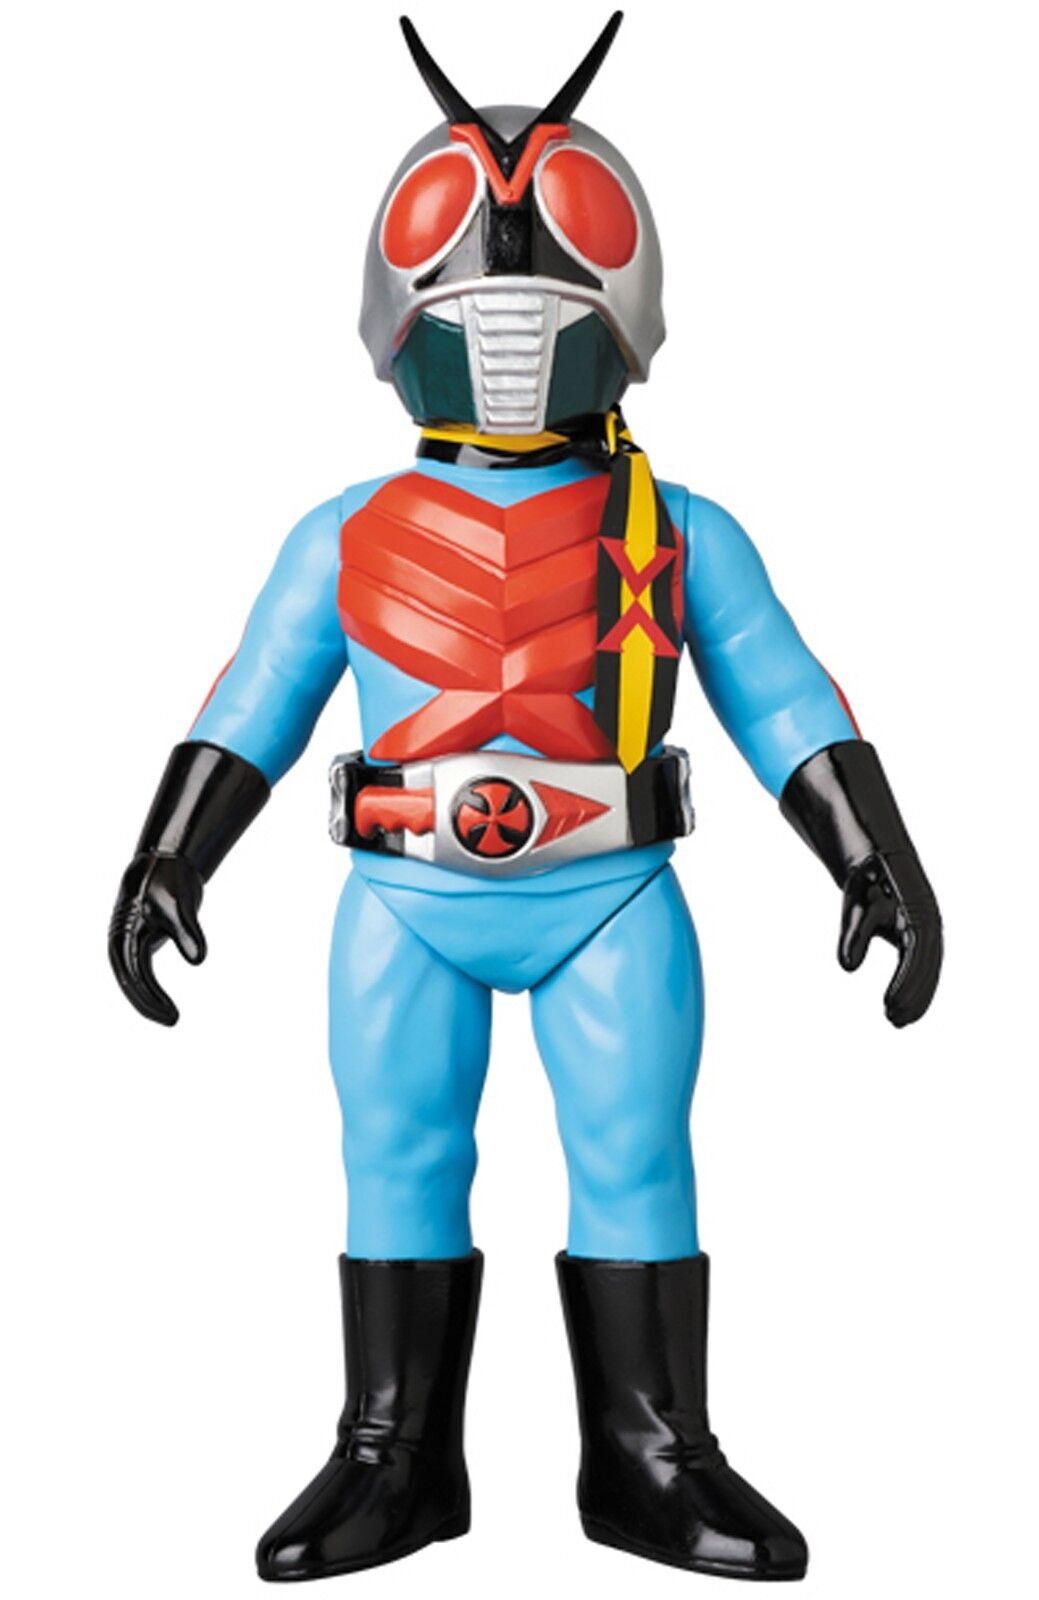 Masked Rider X New color Ver. Toei Retro Sofubi Vinyl Figure Medicomtoy 24cm